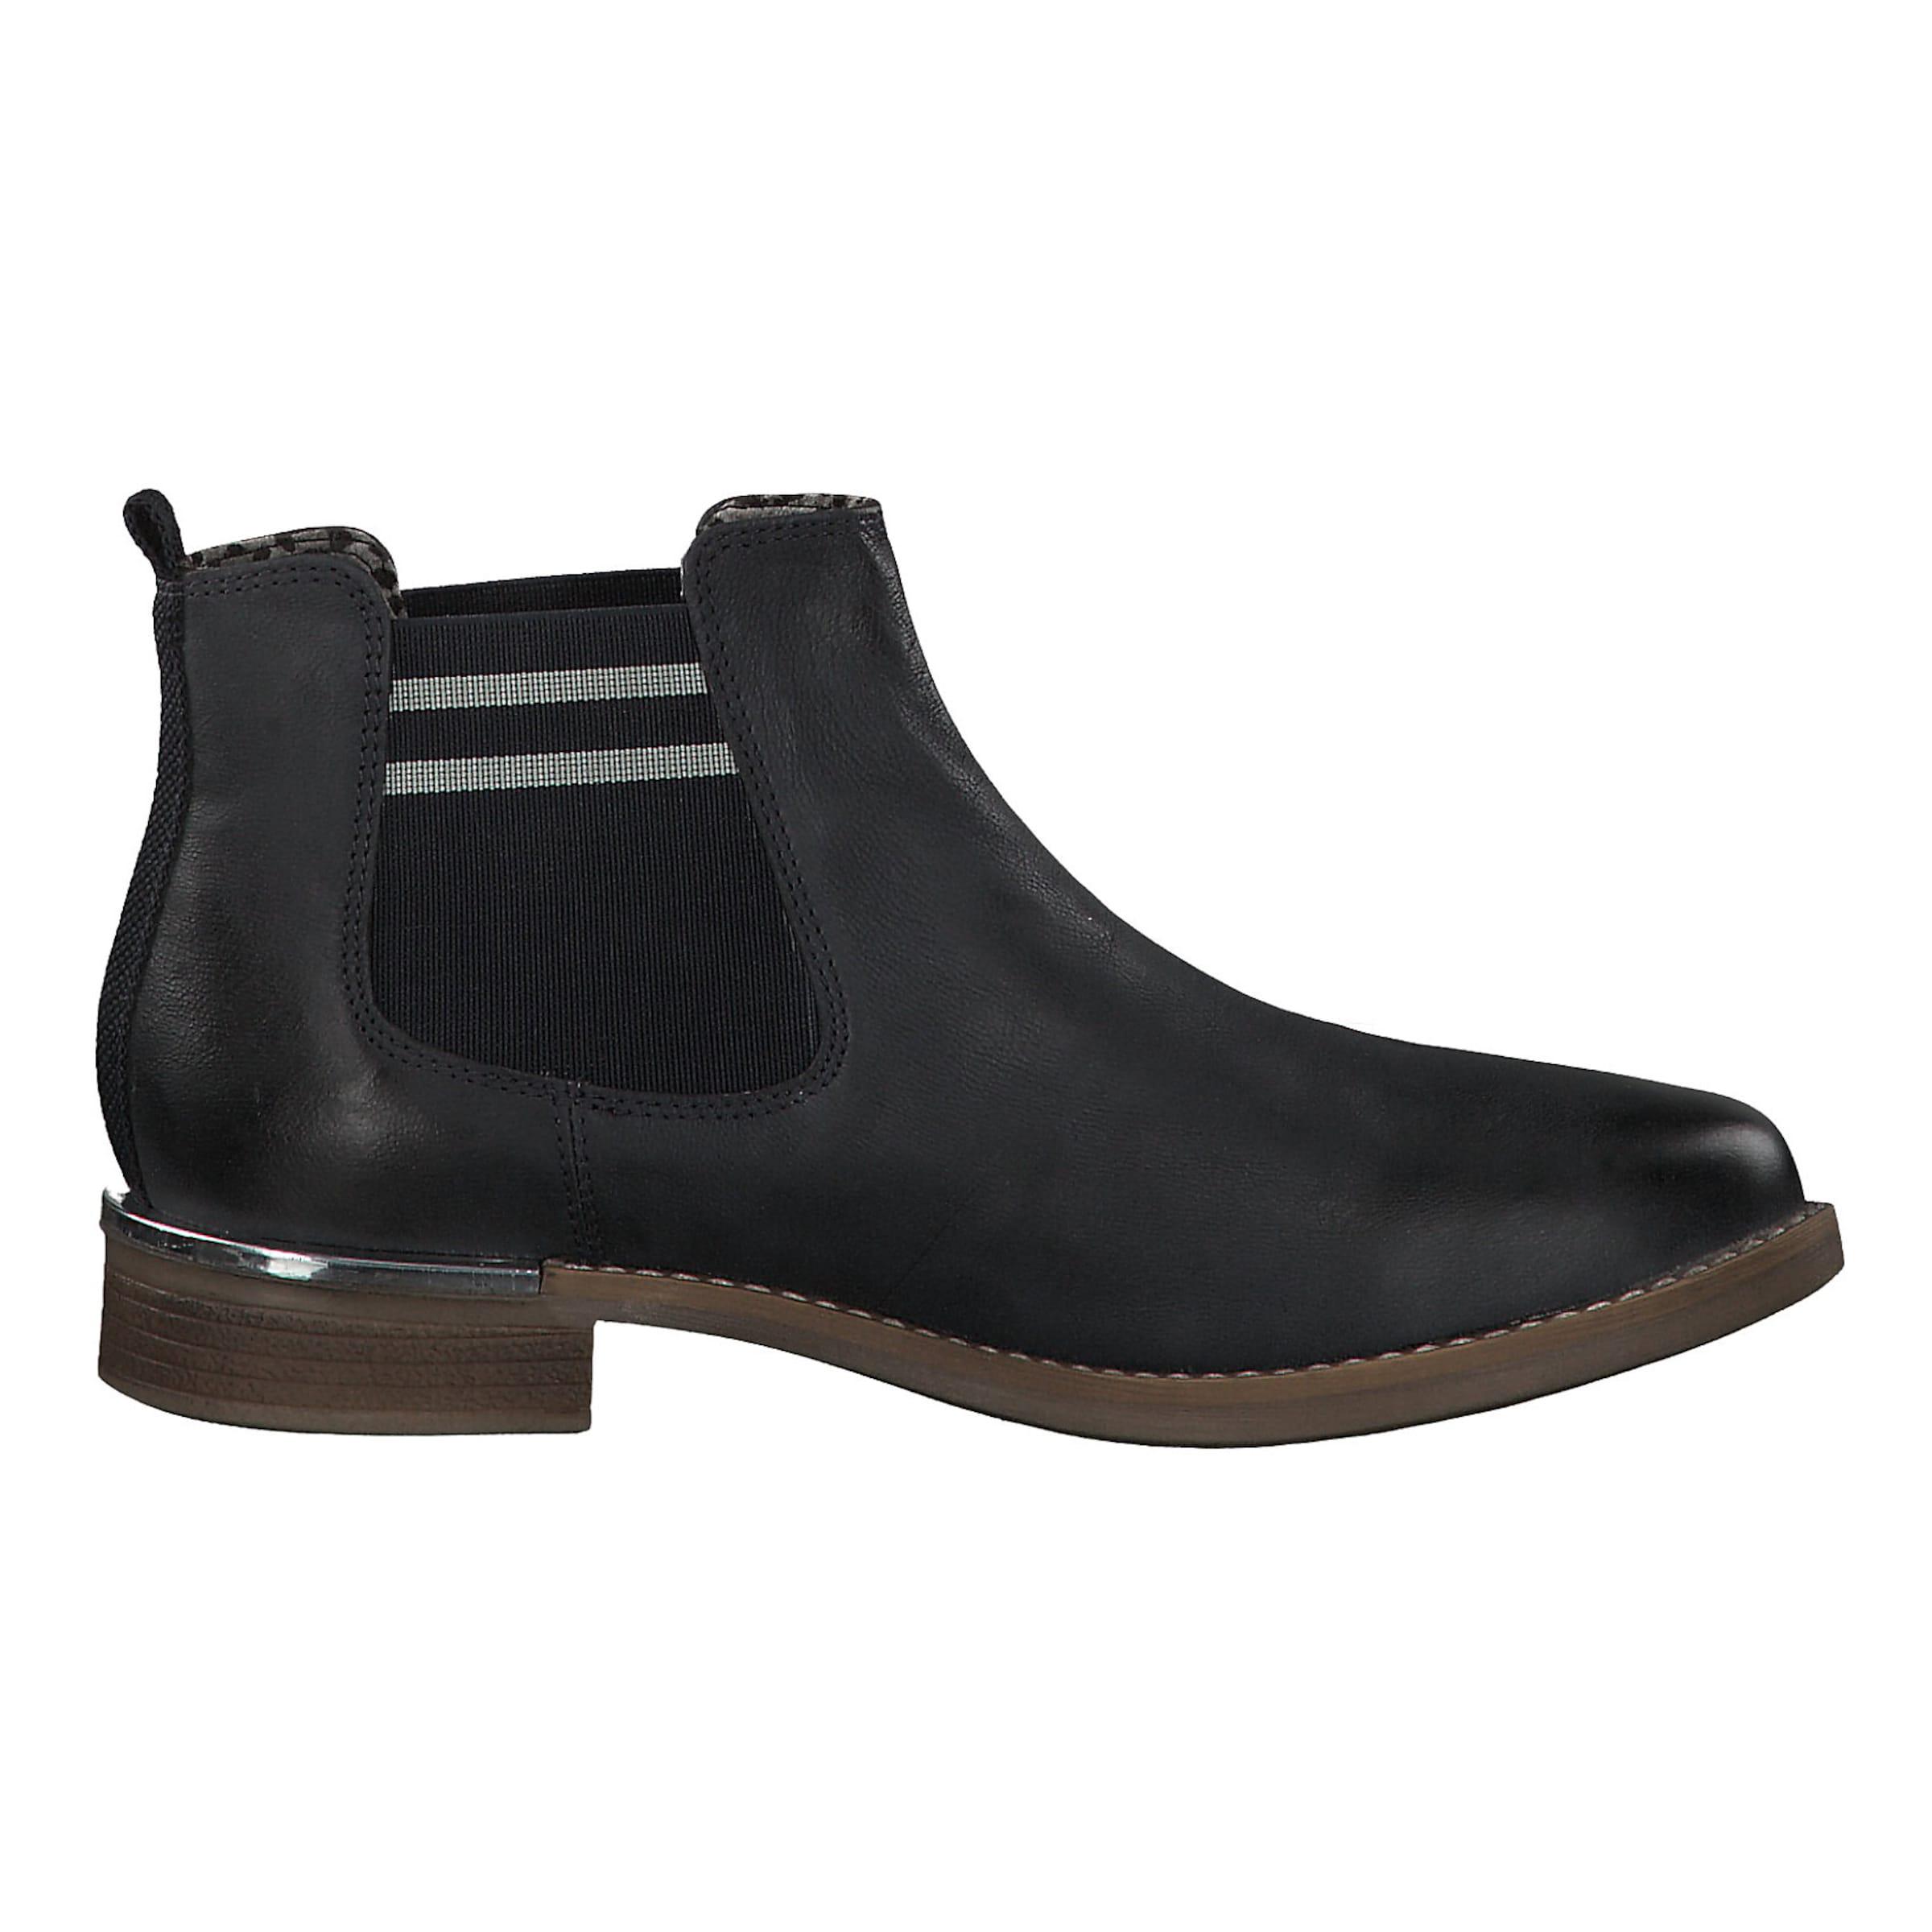 S Dunkelblau Boots In oliver Chelsea FTl1JKc3